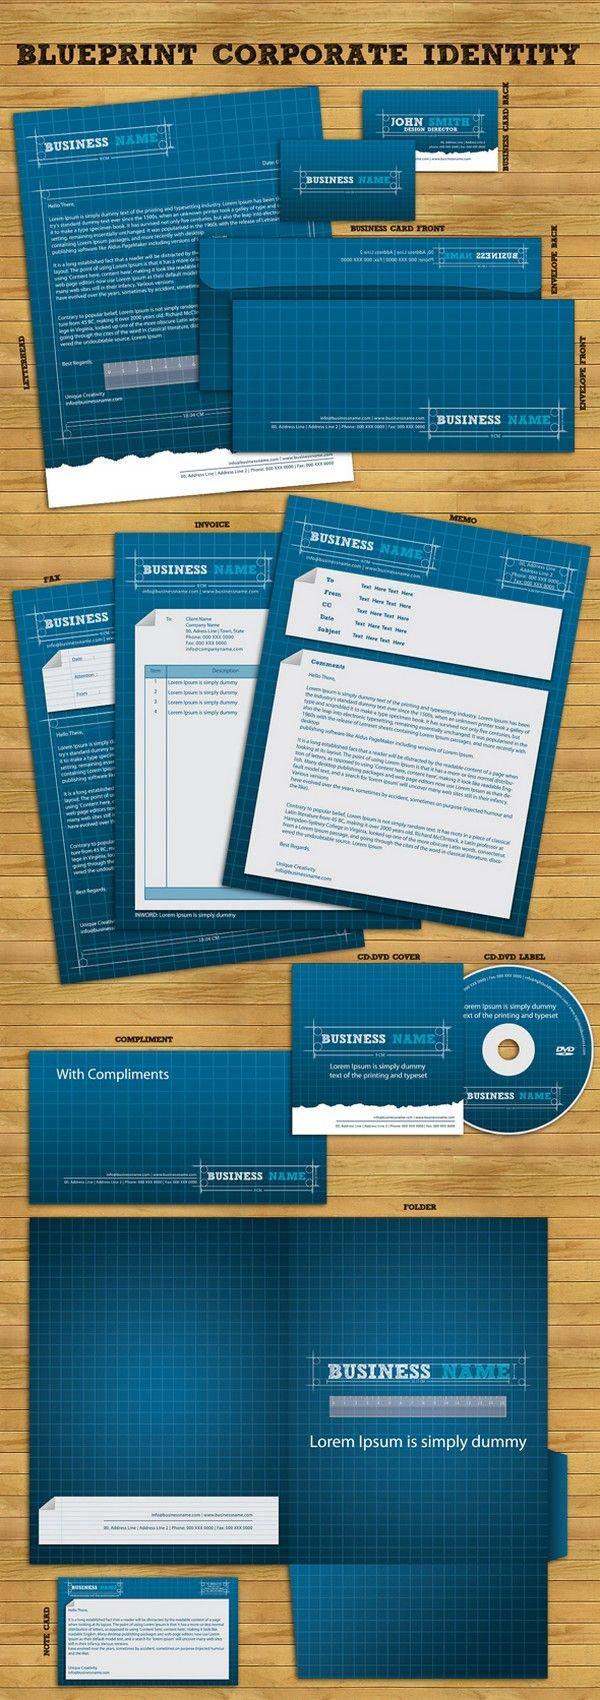 Blueprint corporate identity